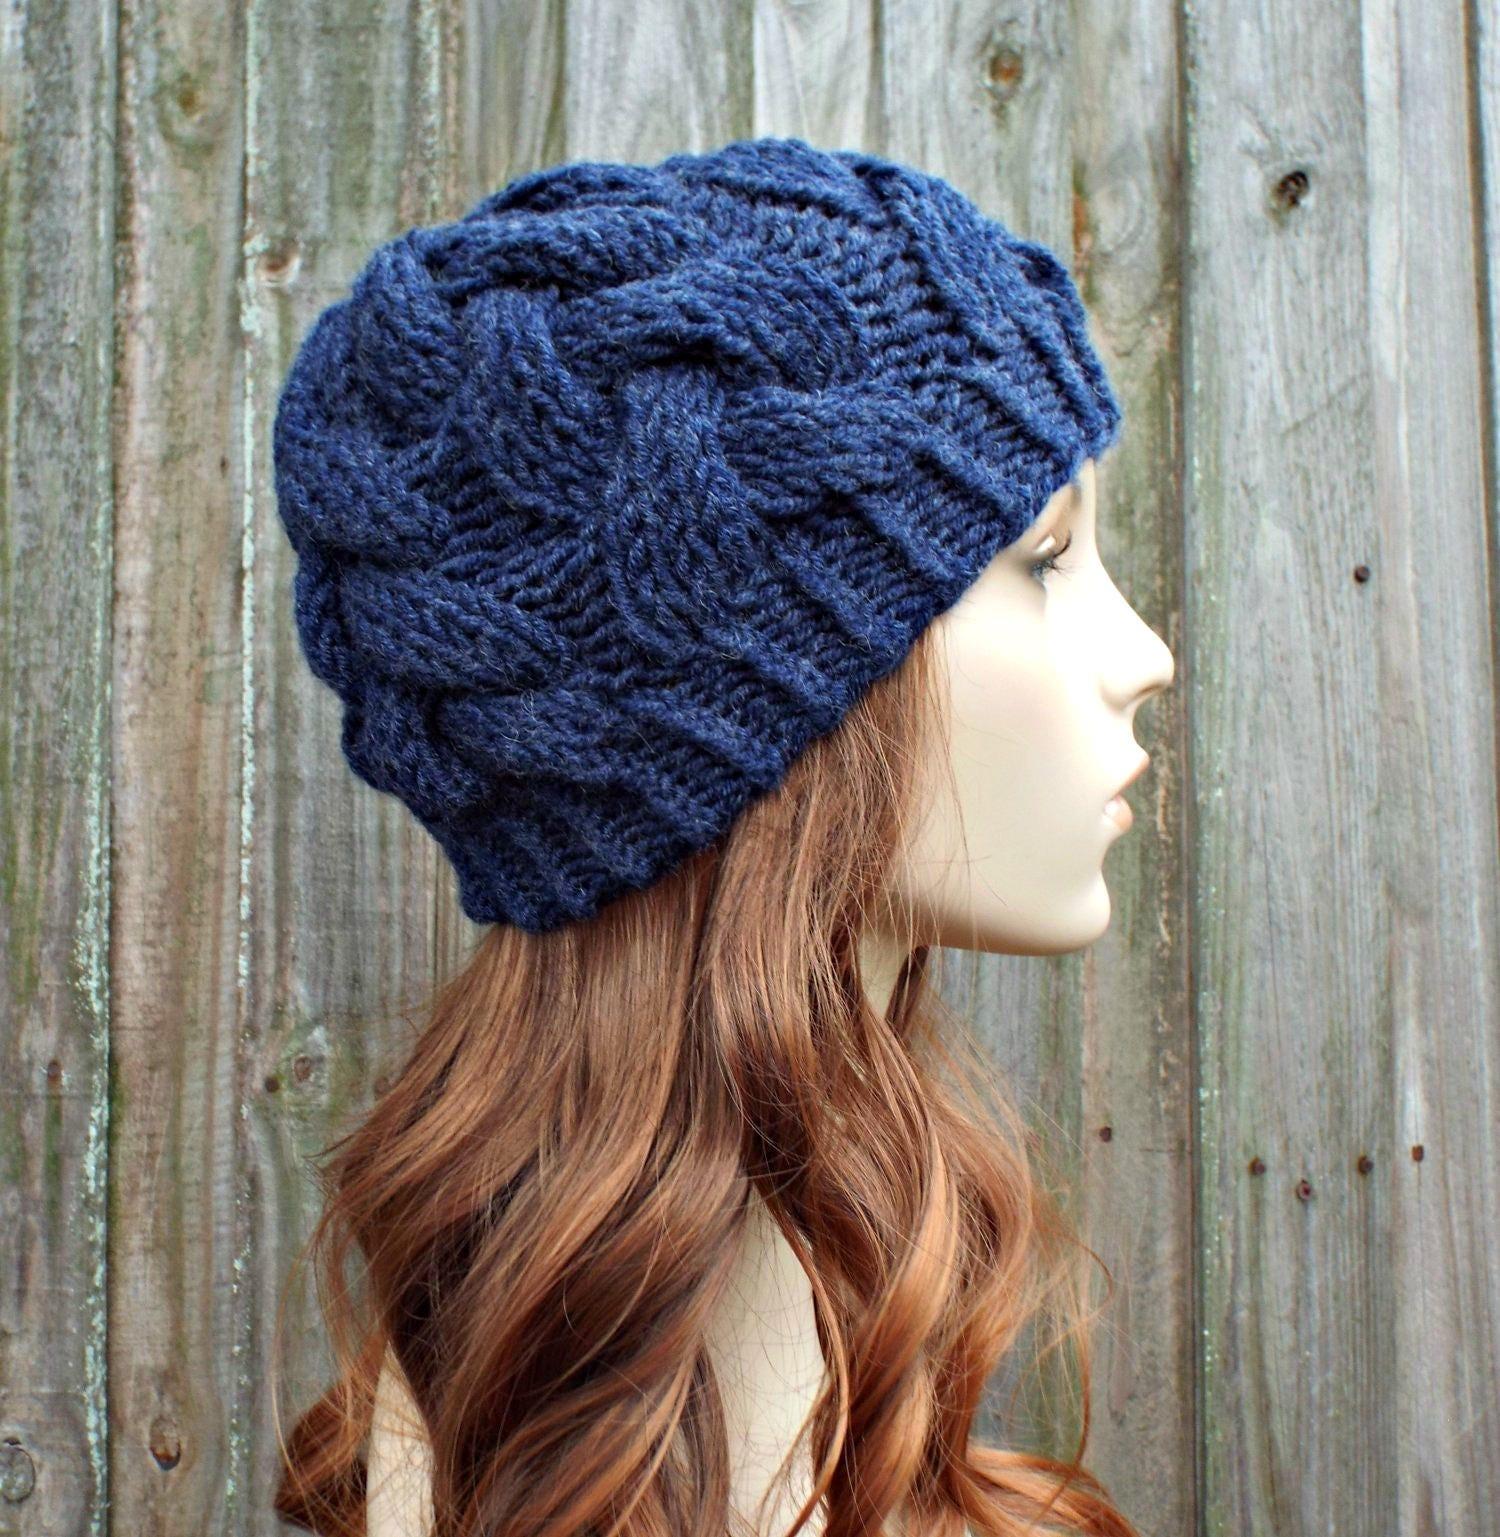 Women s Beanie Knitting Pattern : Instant Download Cable Beanie Knitting Pattern - Knit Hat ...